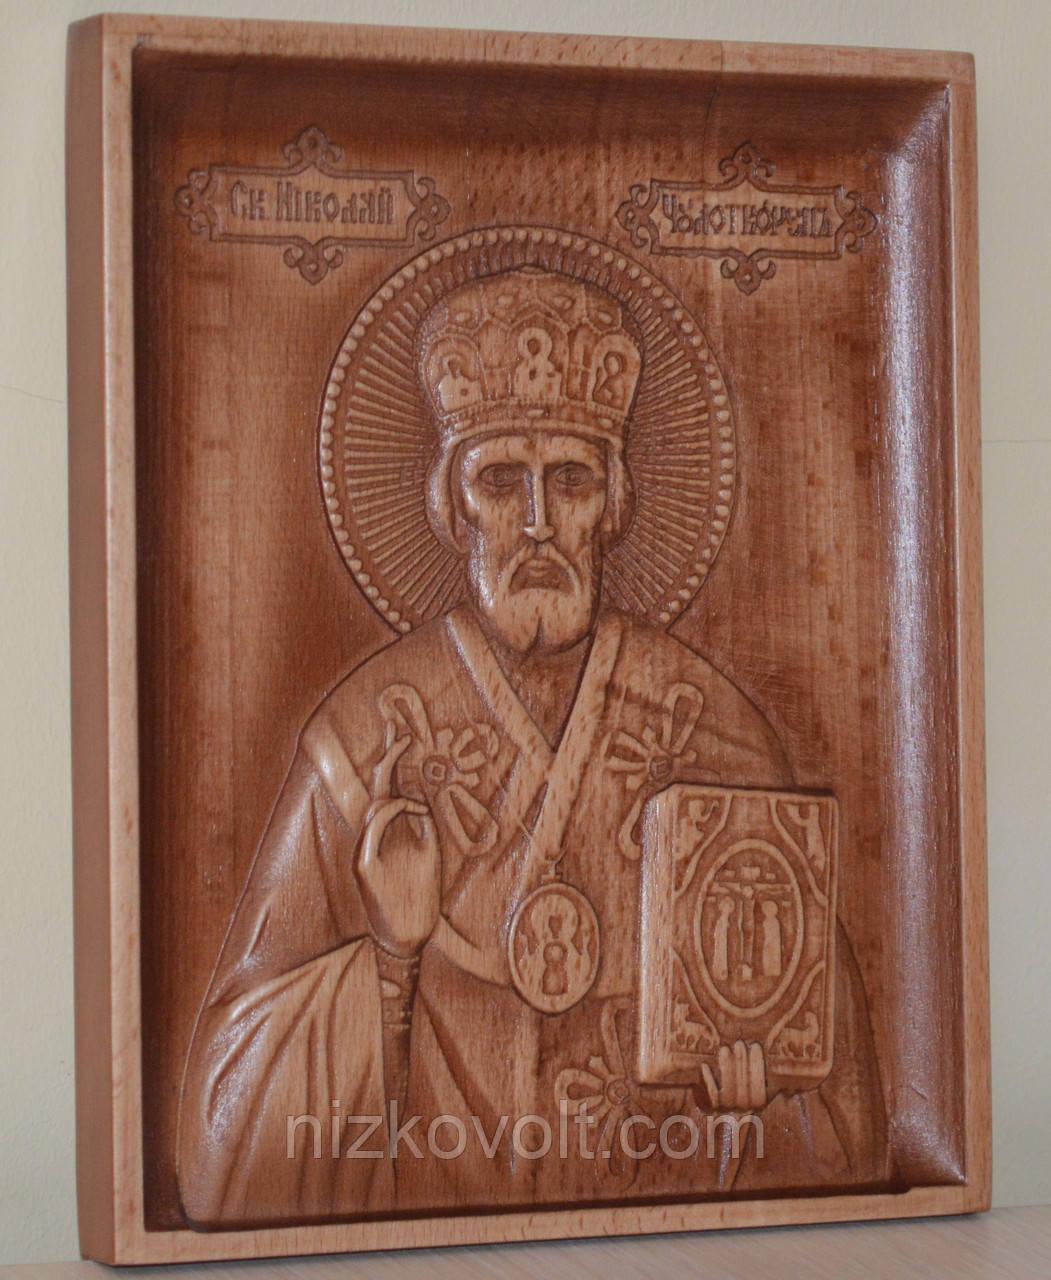 Церковная утварь-Икона Николай Чудотворец (160х200х18)